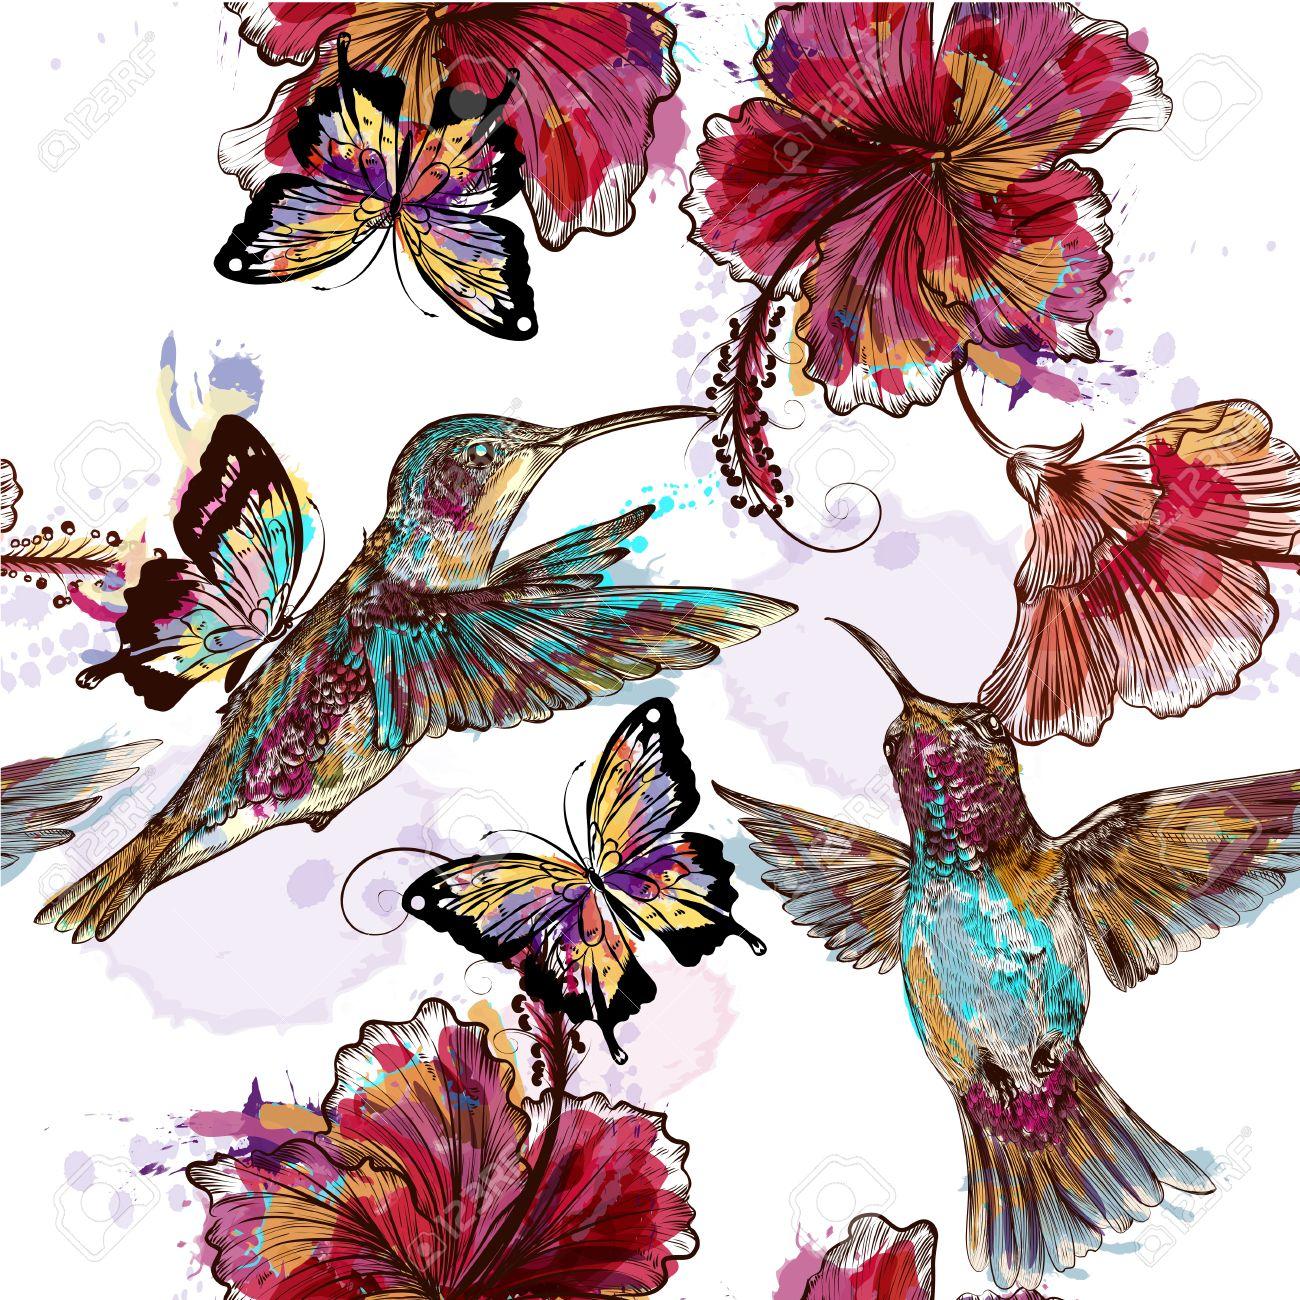 Floral Seamless Wallpaper Pattern With Hummingbirds Butterflies